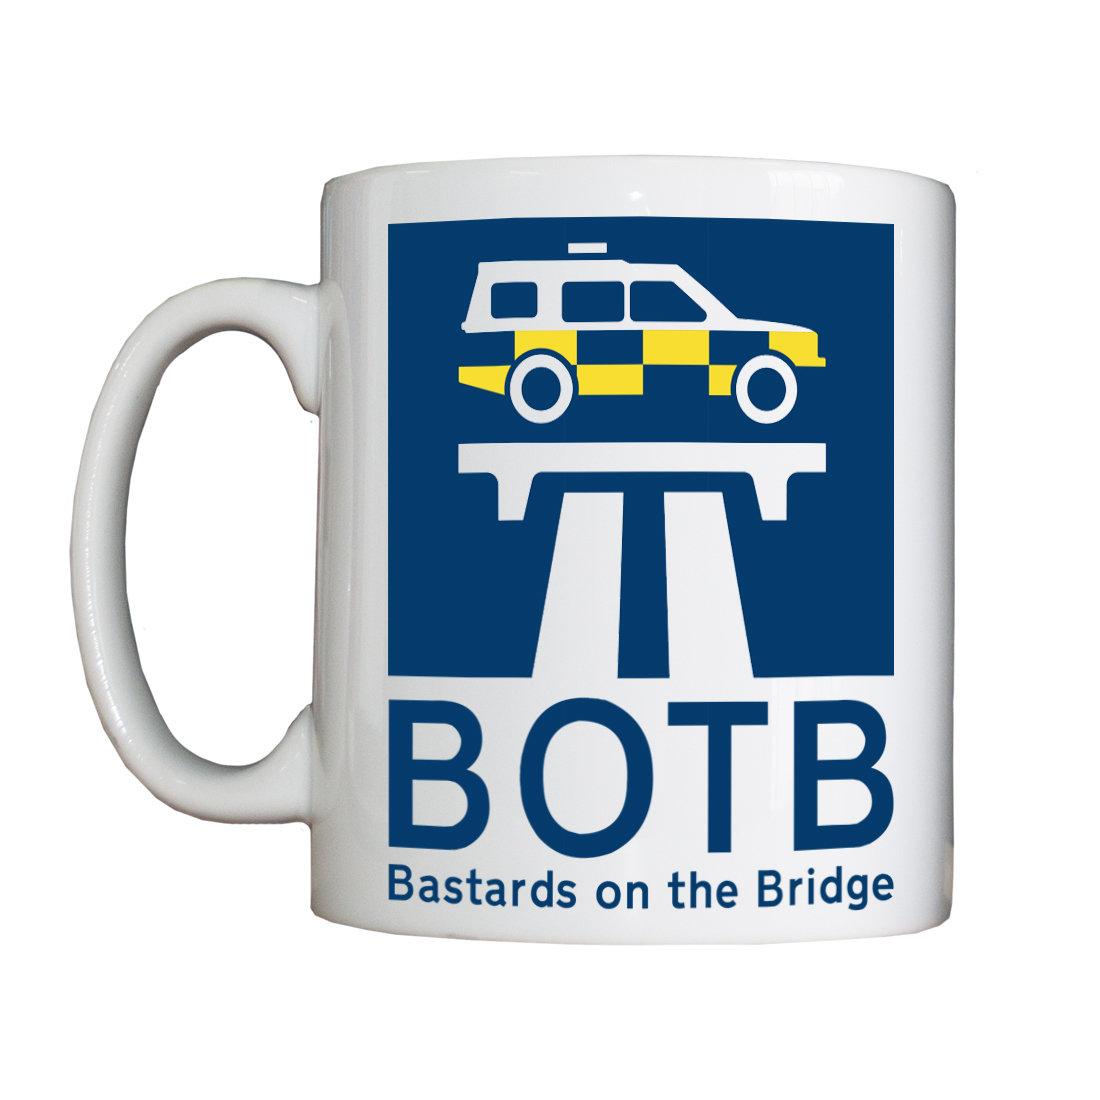 Personalised 'BOTB' Drinking Vessel BOTBVessel